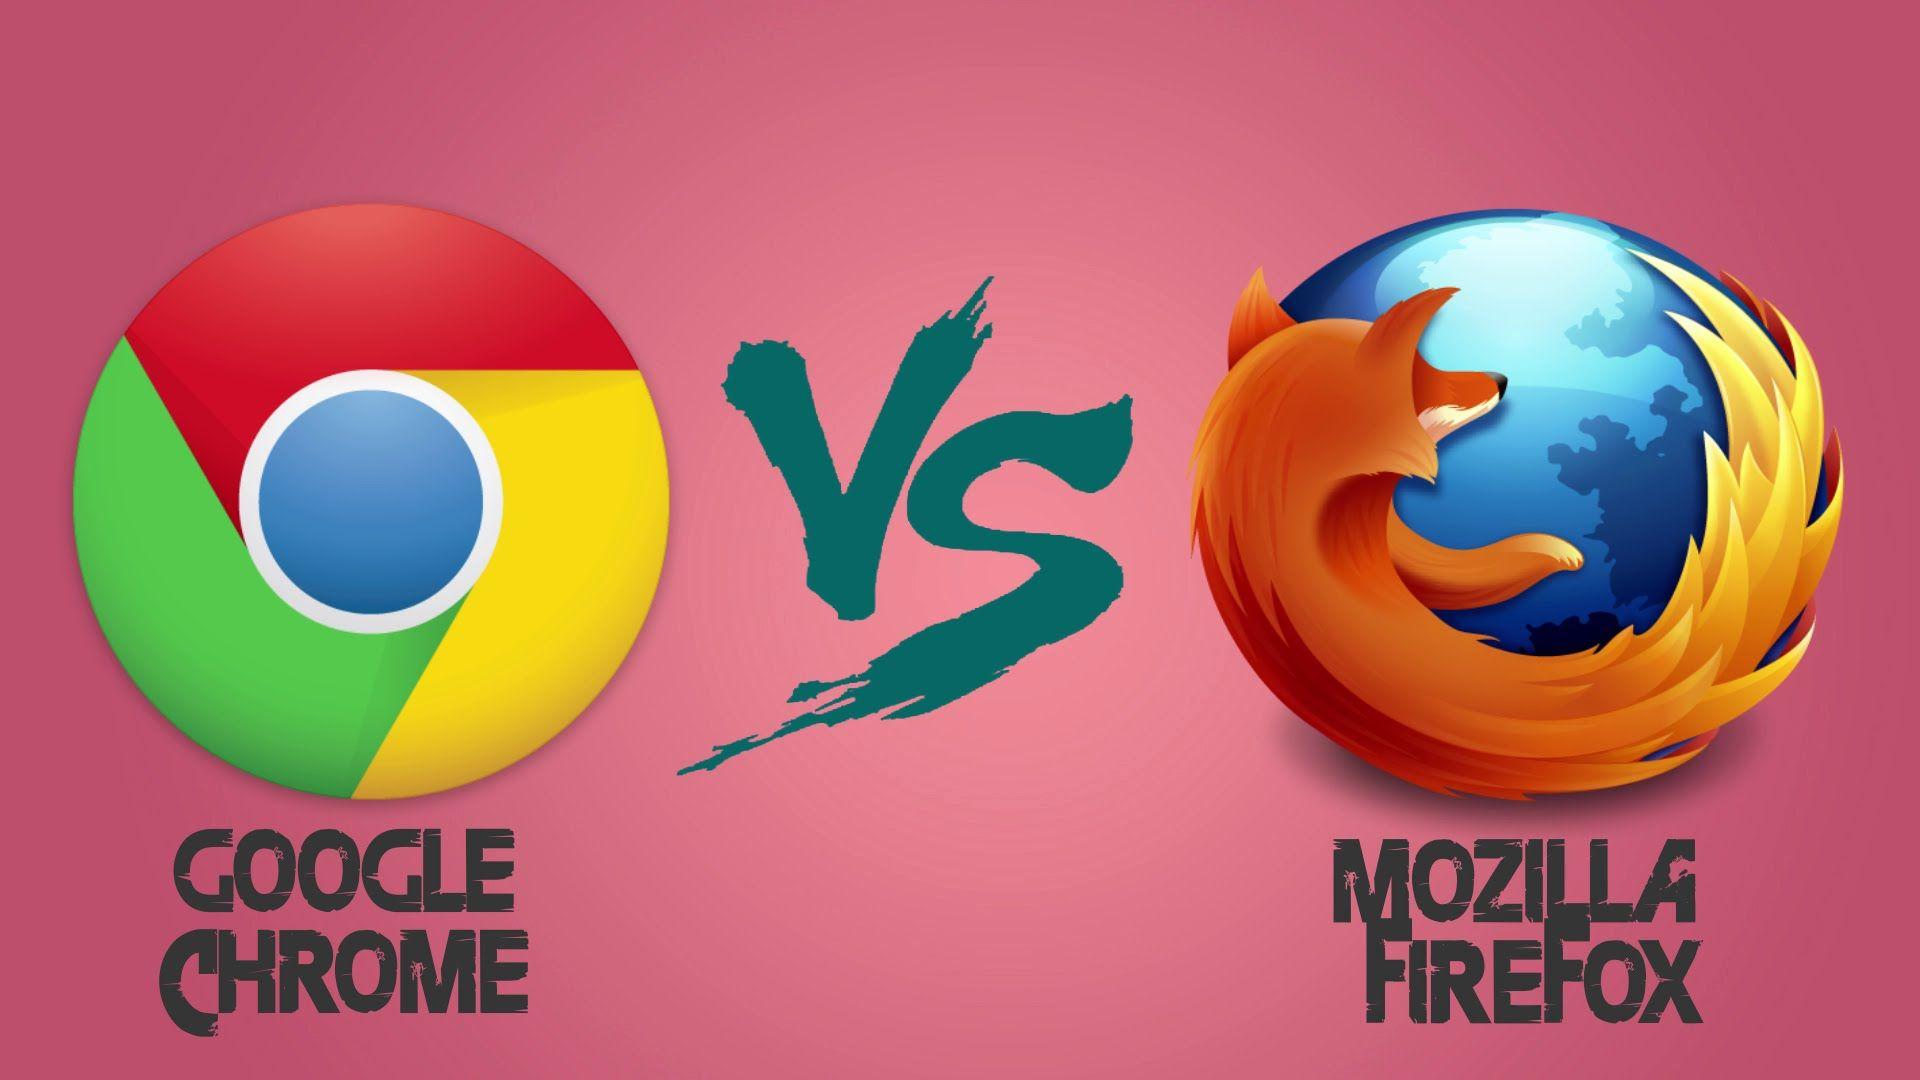 google chrome vs mozilla firefor